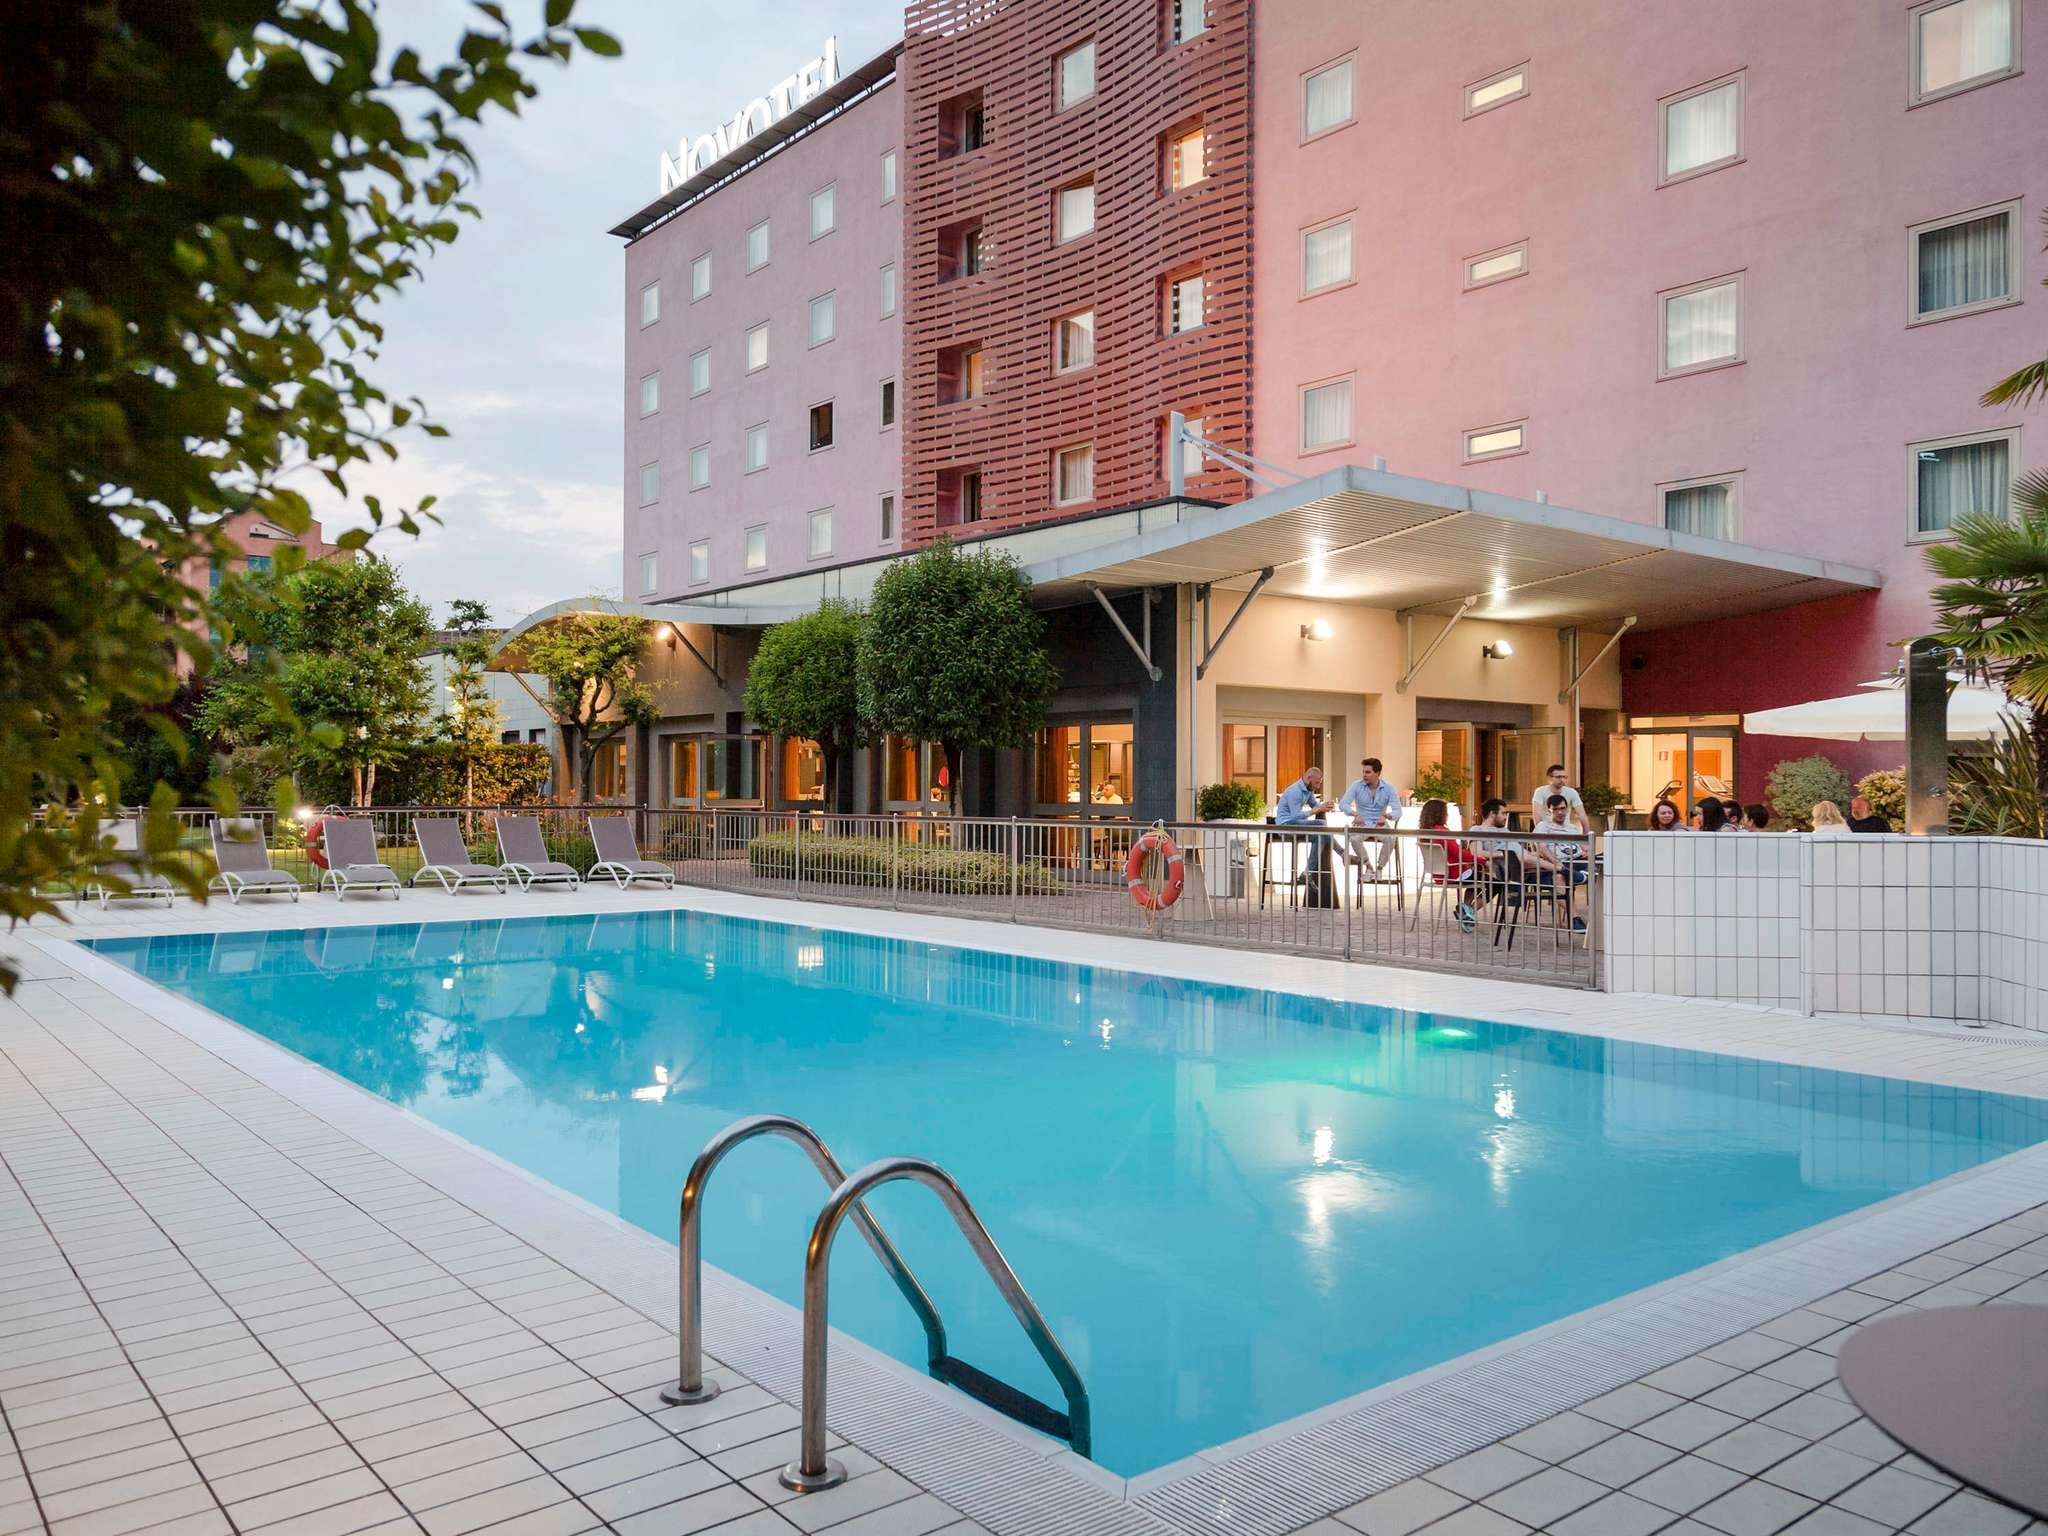 Hotell – Novotel Brescia 2